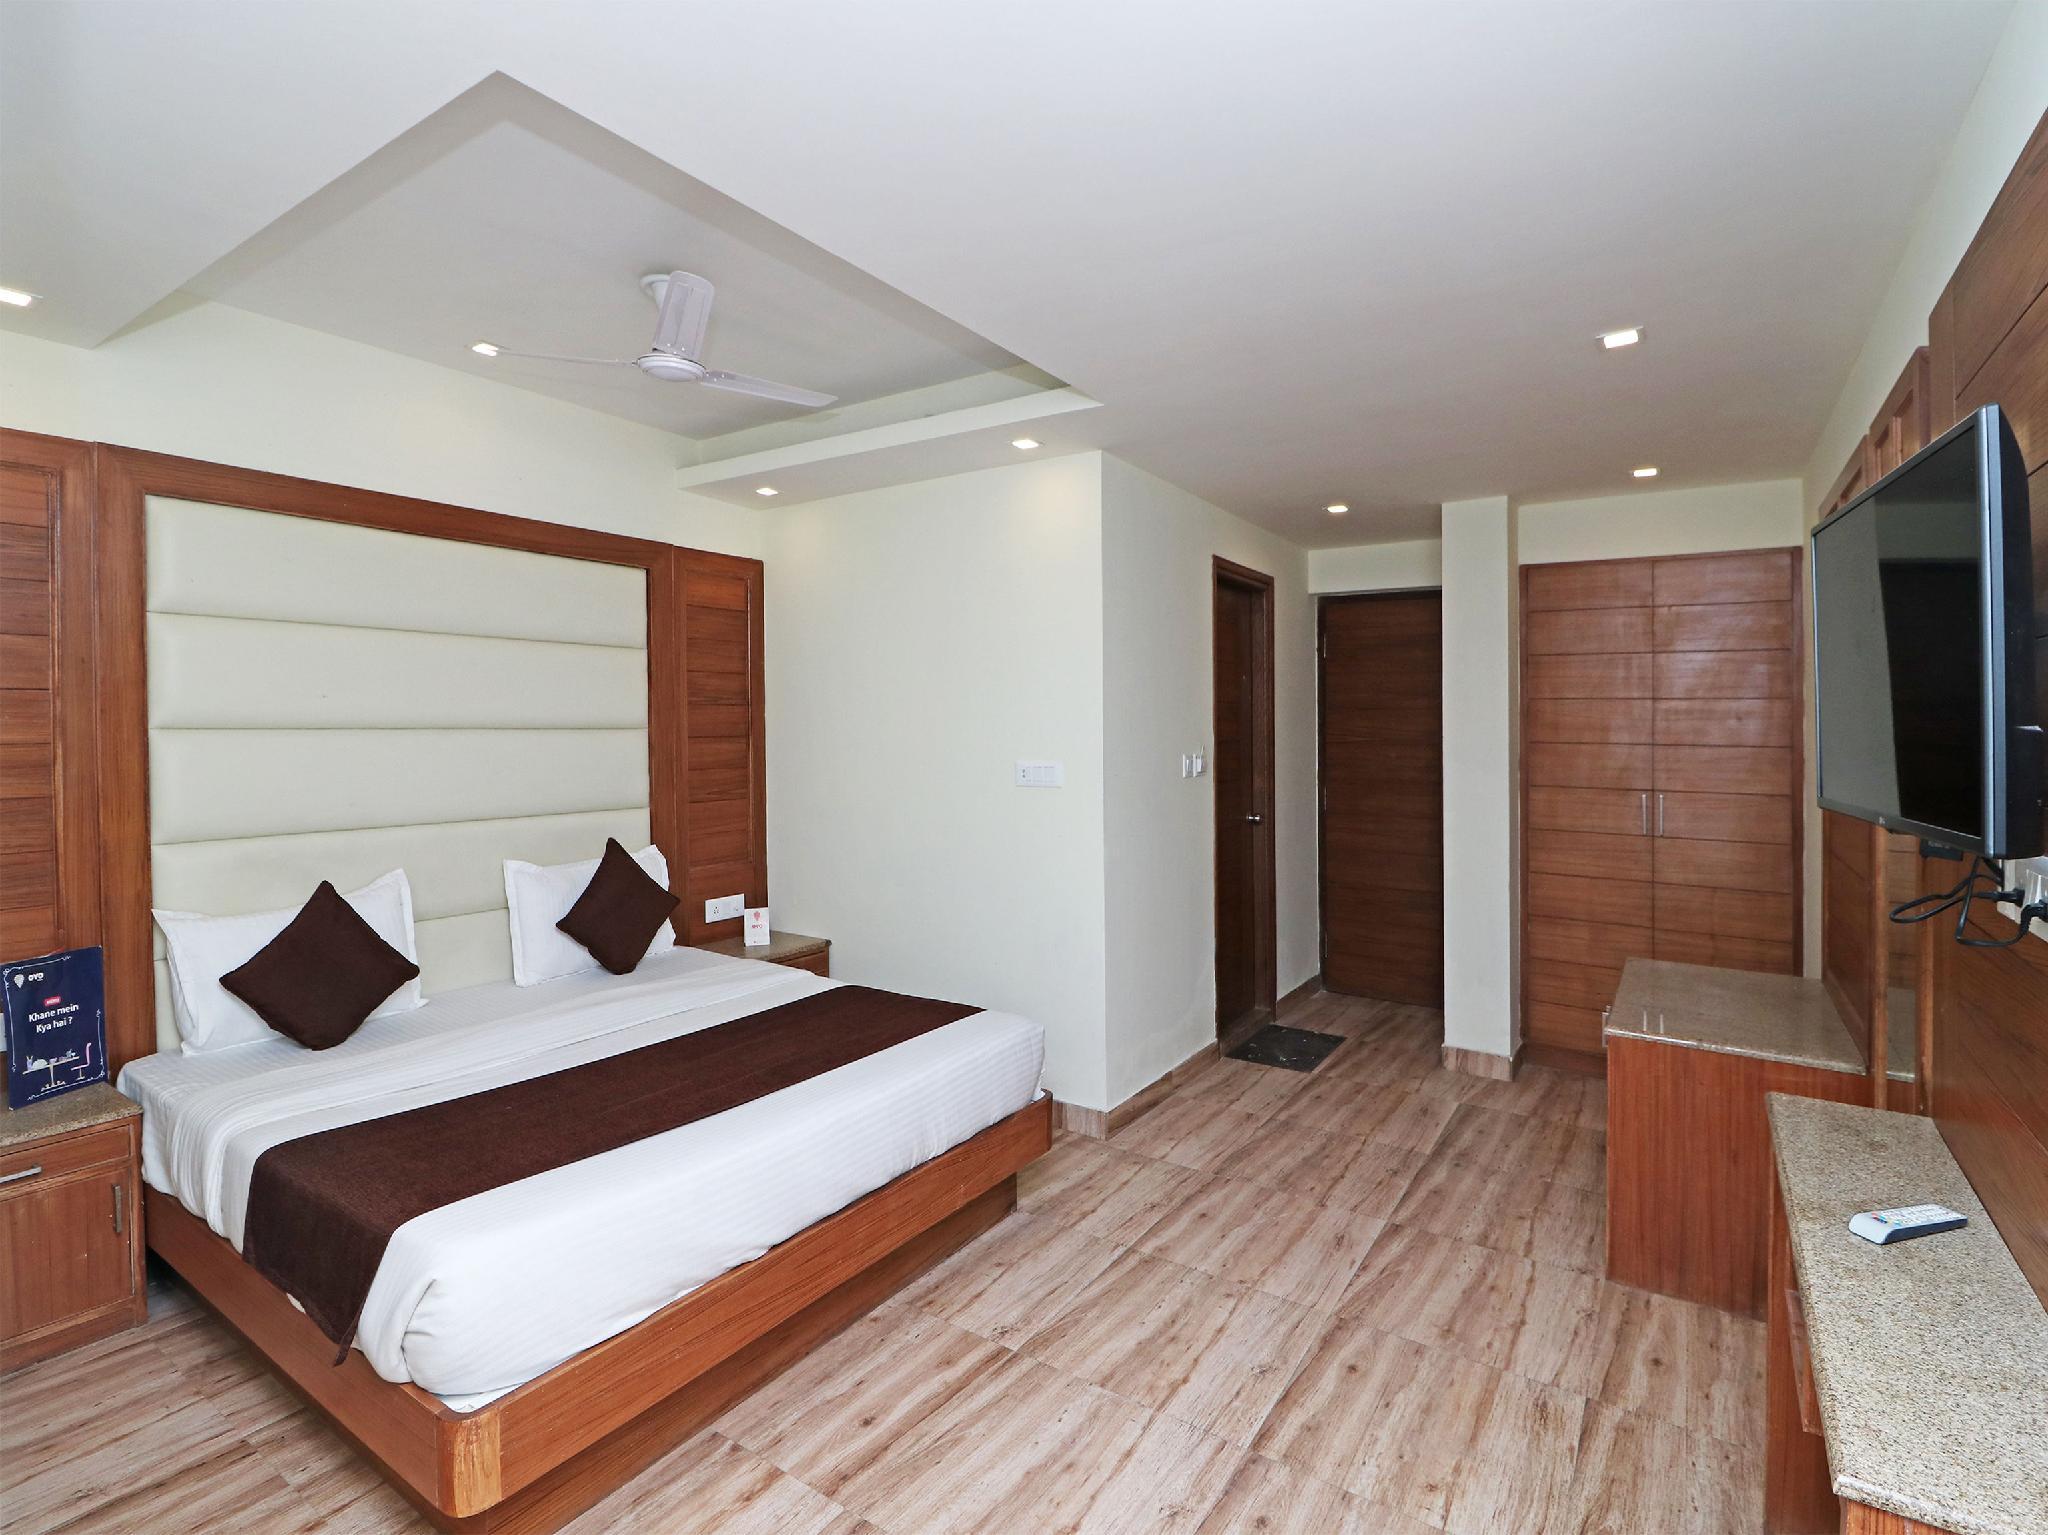 OYO 13908 Hotel India